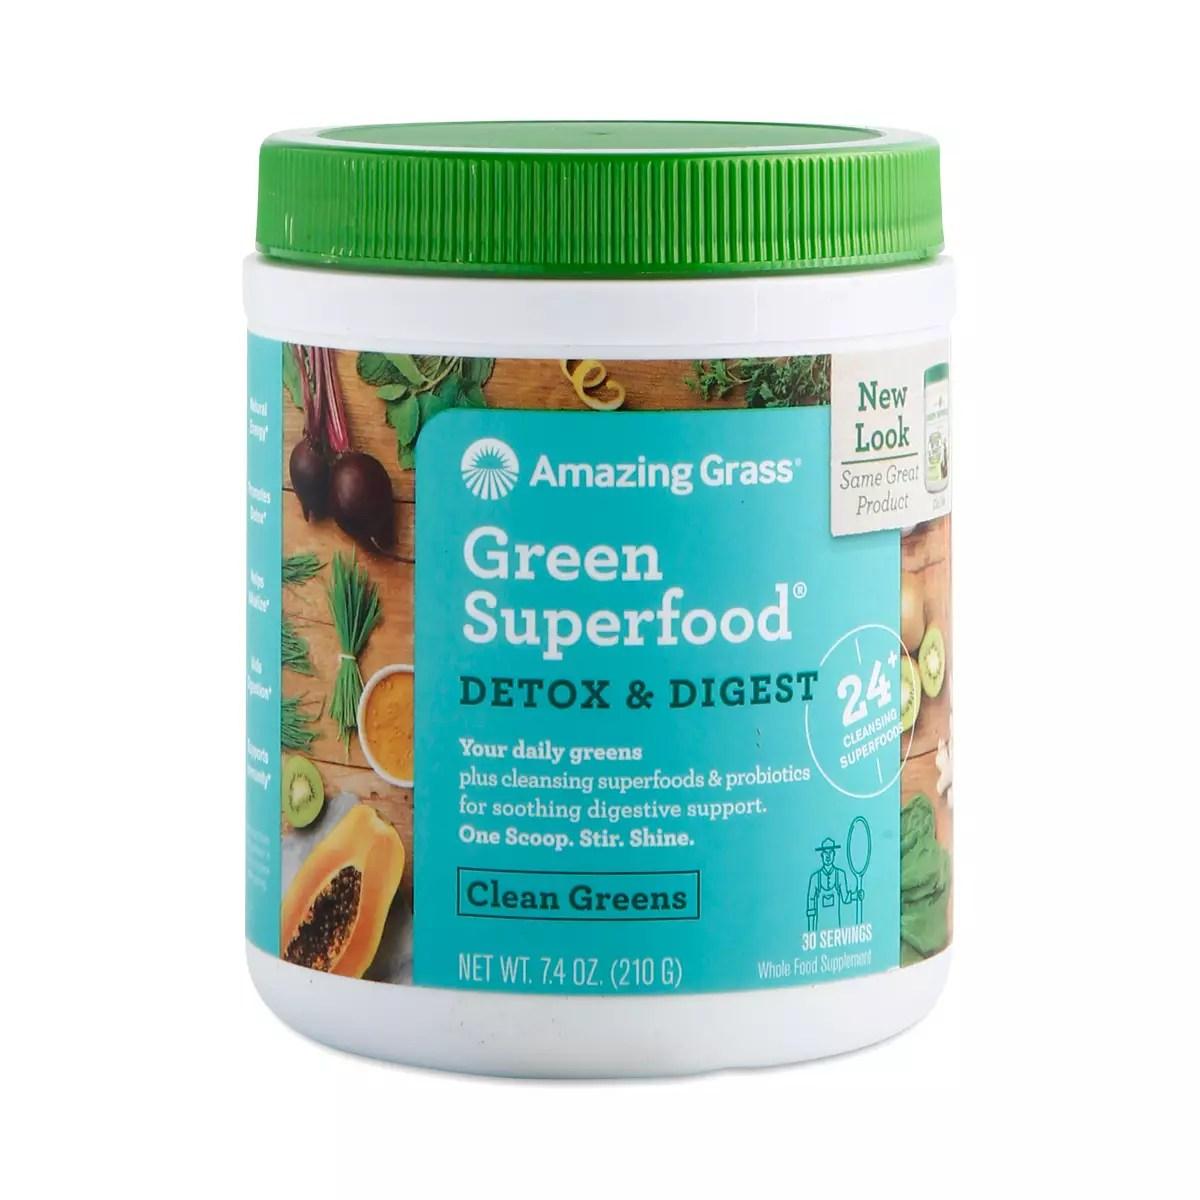 Detox & Digest Green Superfood Powder - Thrive Market